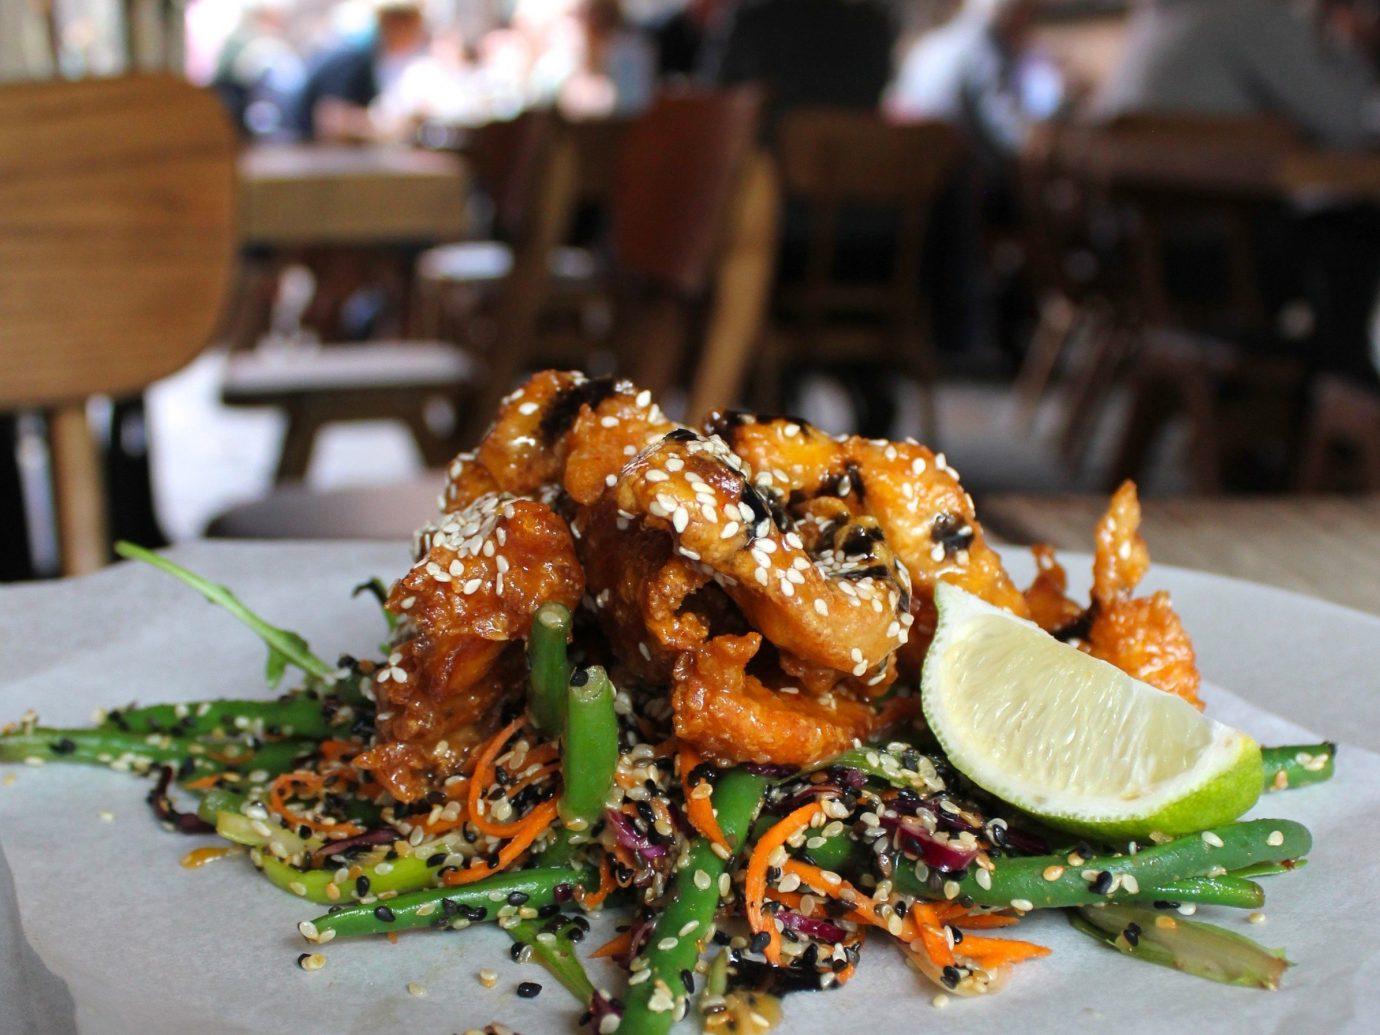 Dublin Ireland Trip Ideas table food indoor plate dish cuisine meal Seafood asian food animal source foods fried food appetizer recipe